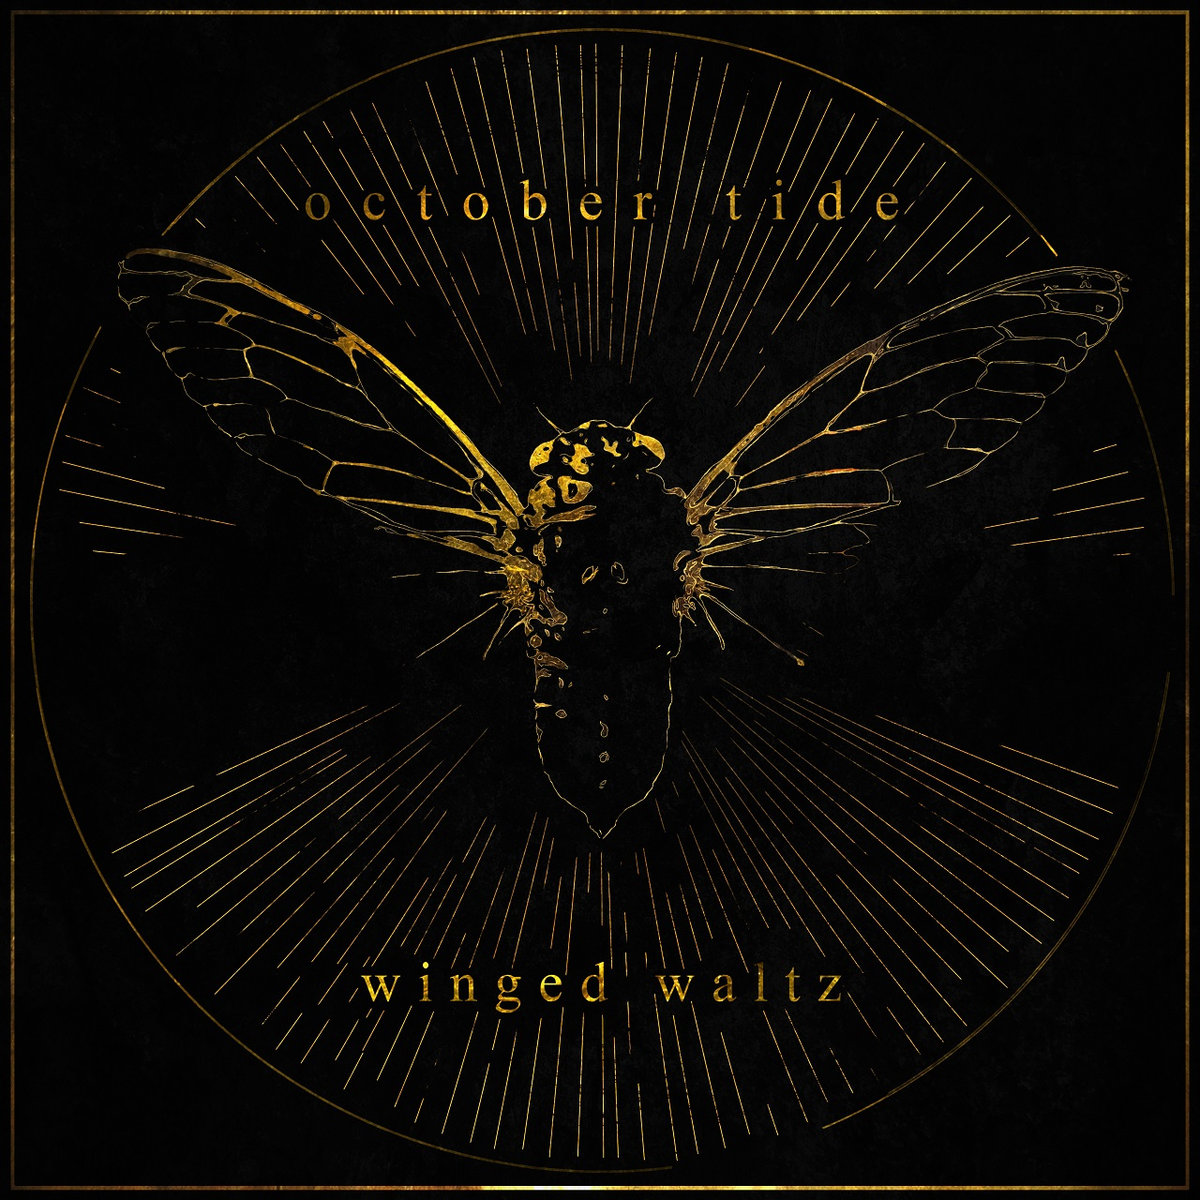 11. October Tide - Winged Waltz